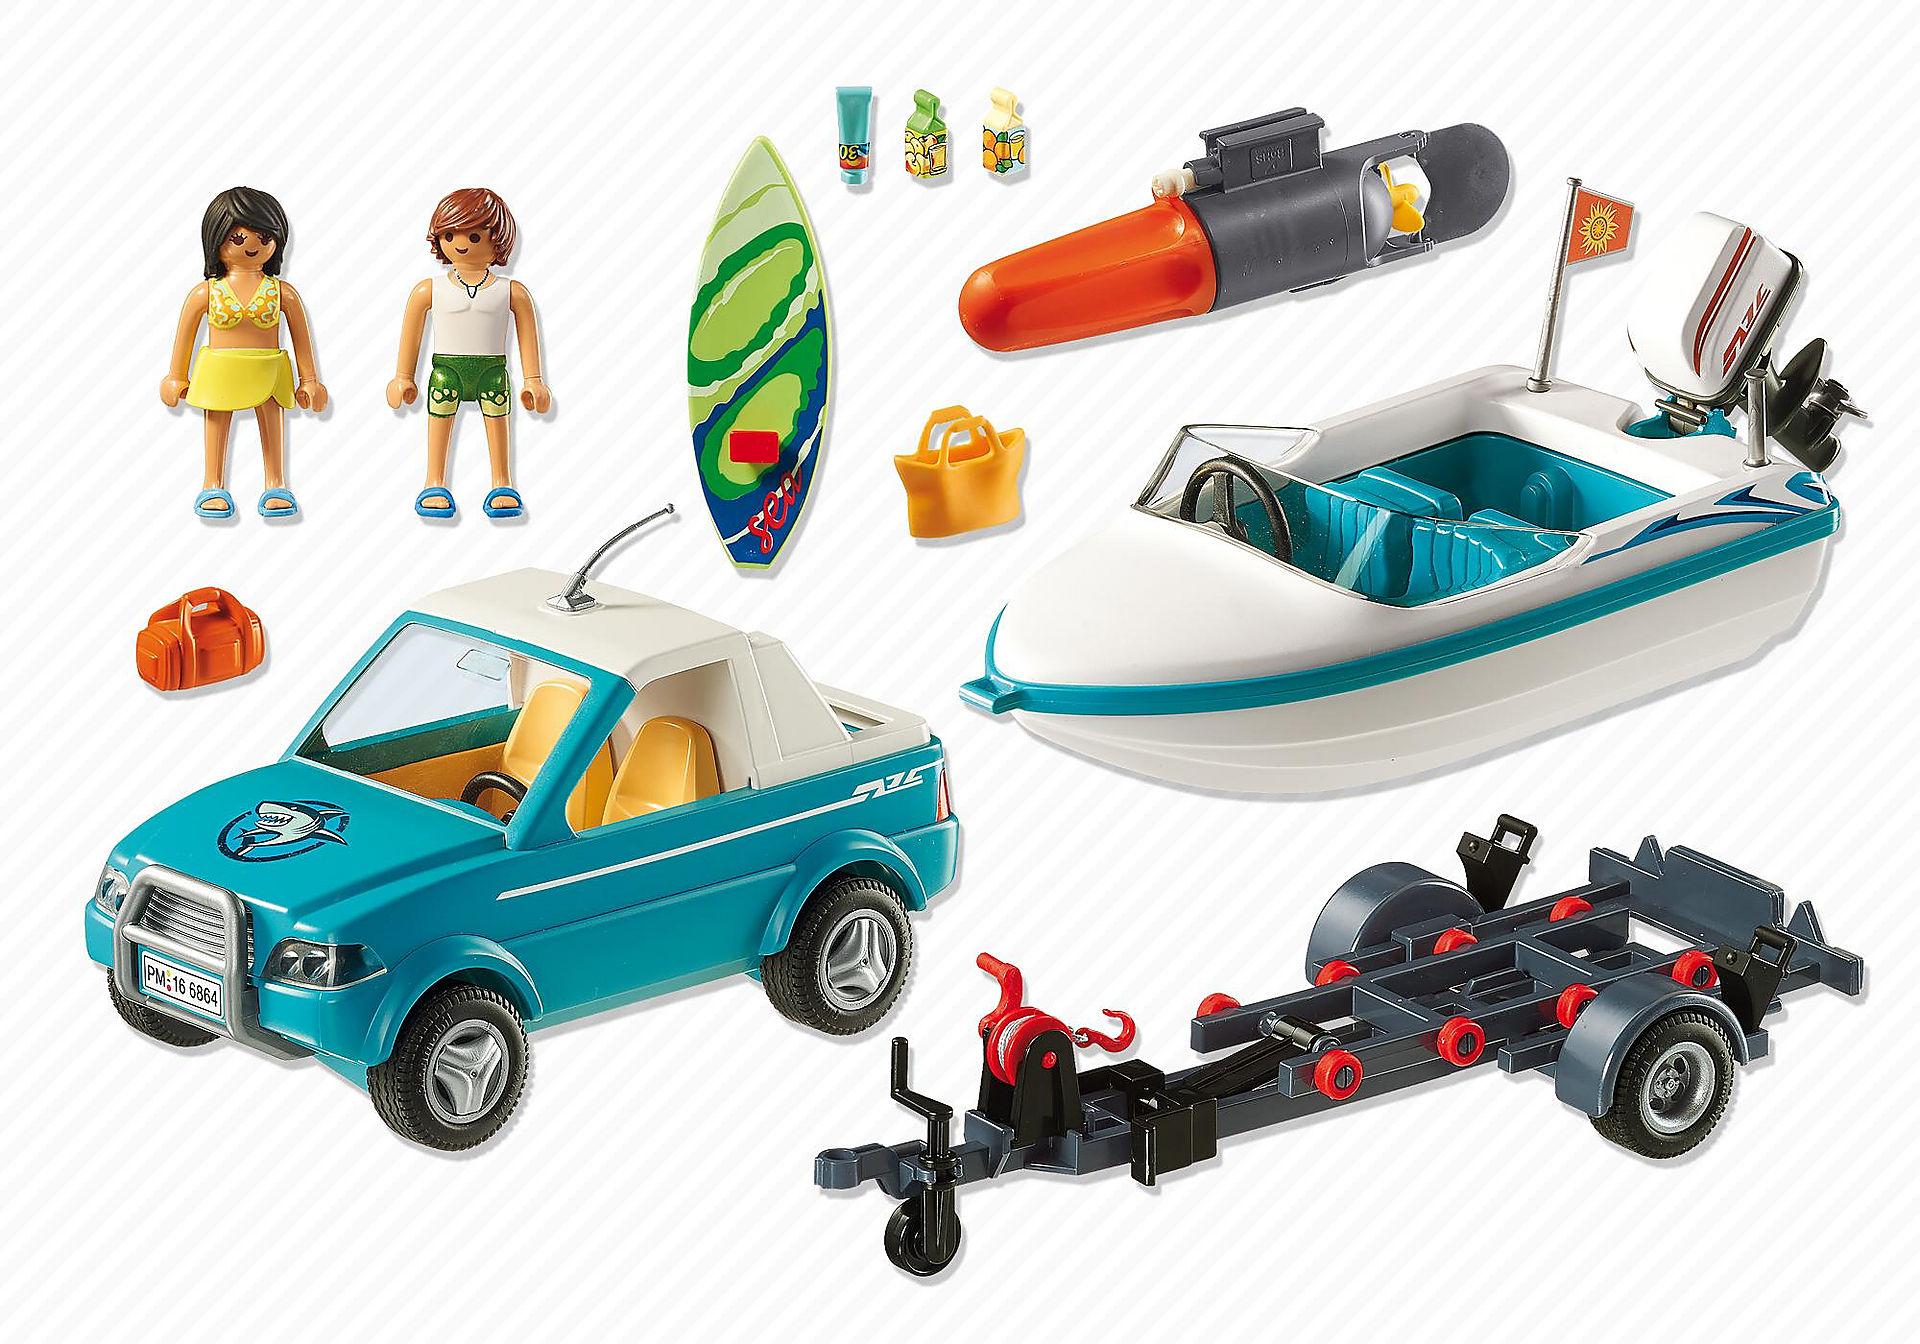 http://media.playmobil.com/i/playmobil/6864_product_box_back/Voiture  avec bateau et moteur submersible